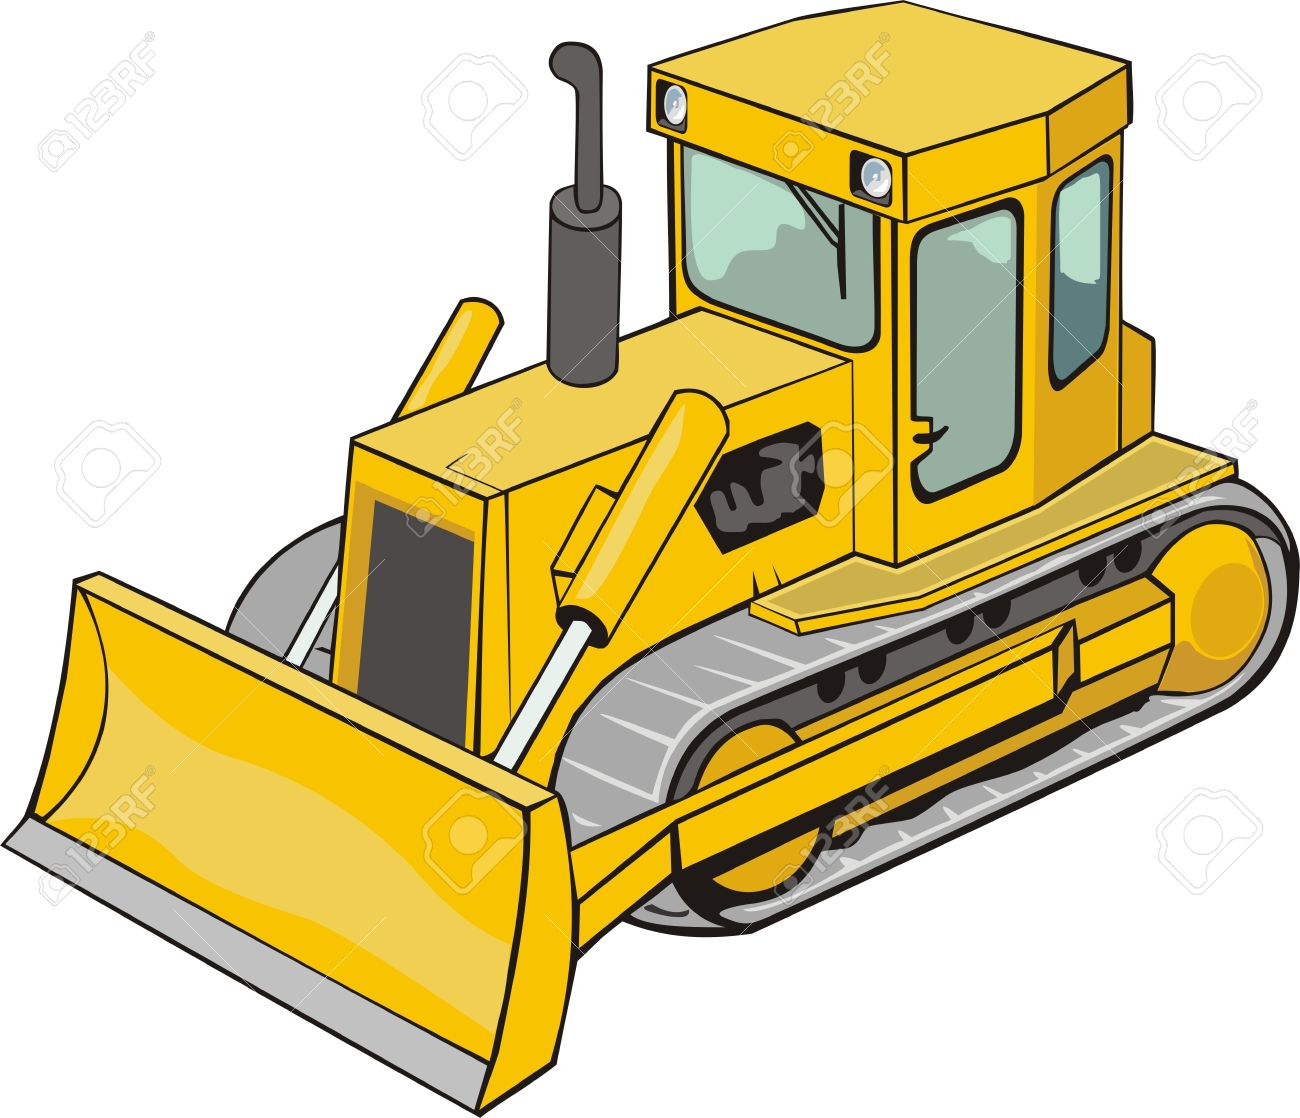 Bulldozer pictures clip art.